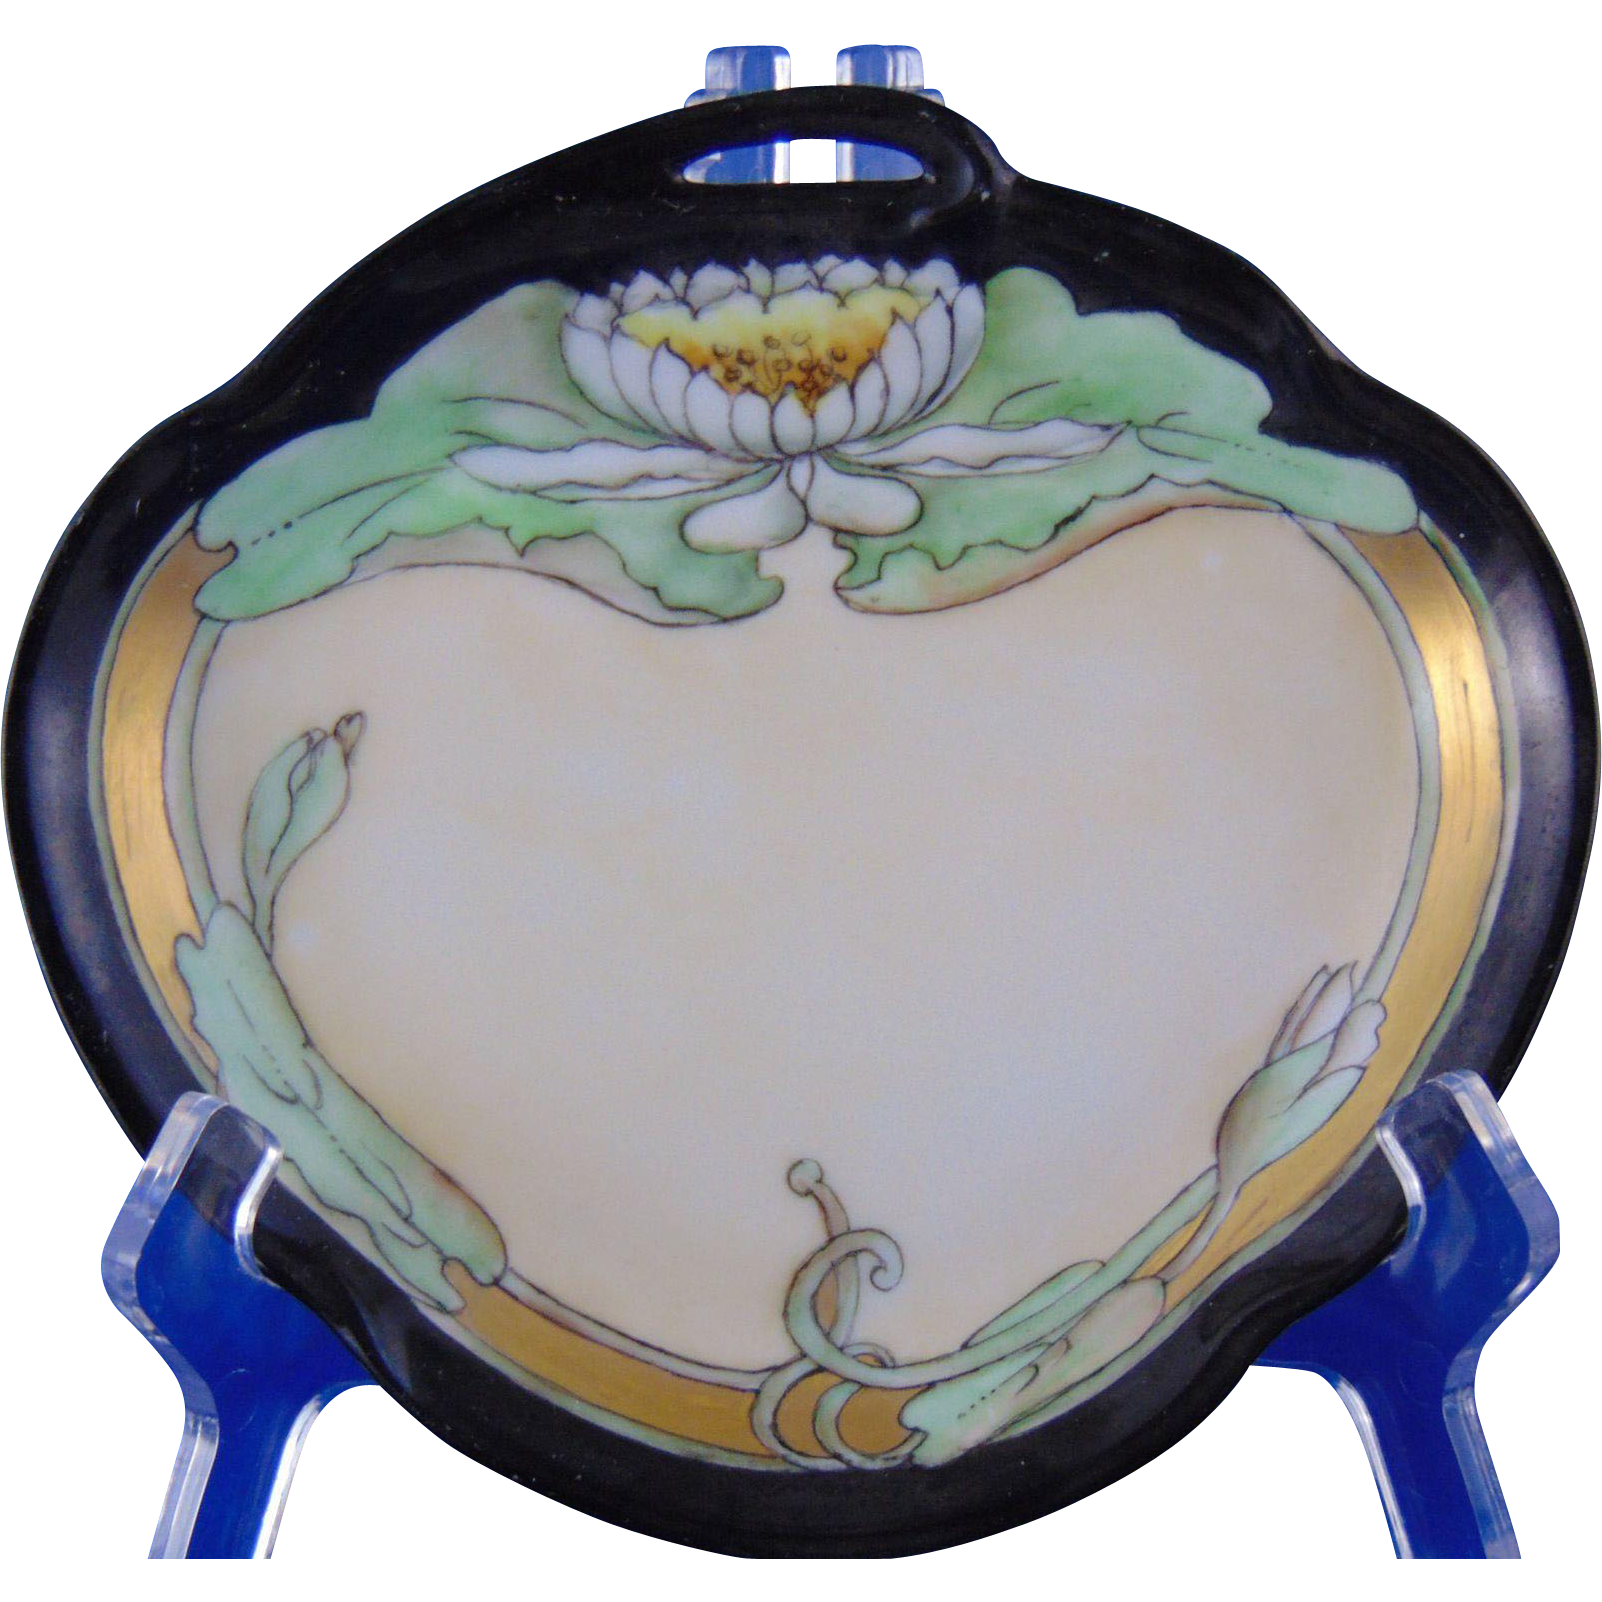 Jaeger & Co. (JC) Bavaria Arts & Crafts Lotus Blossom Dish (c.1902-1930)